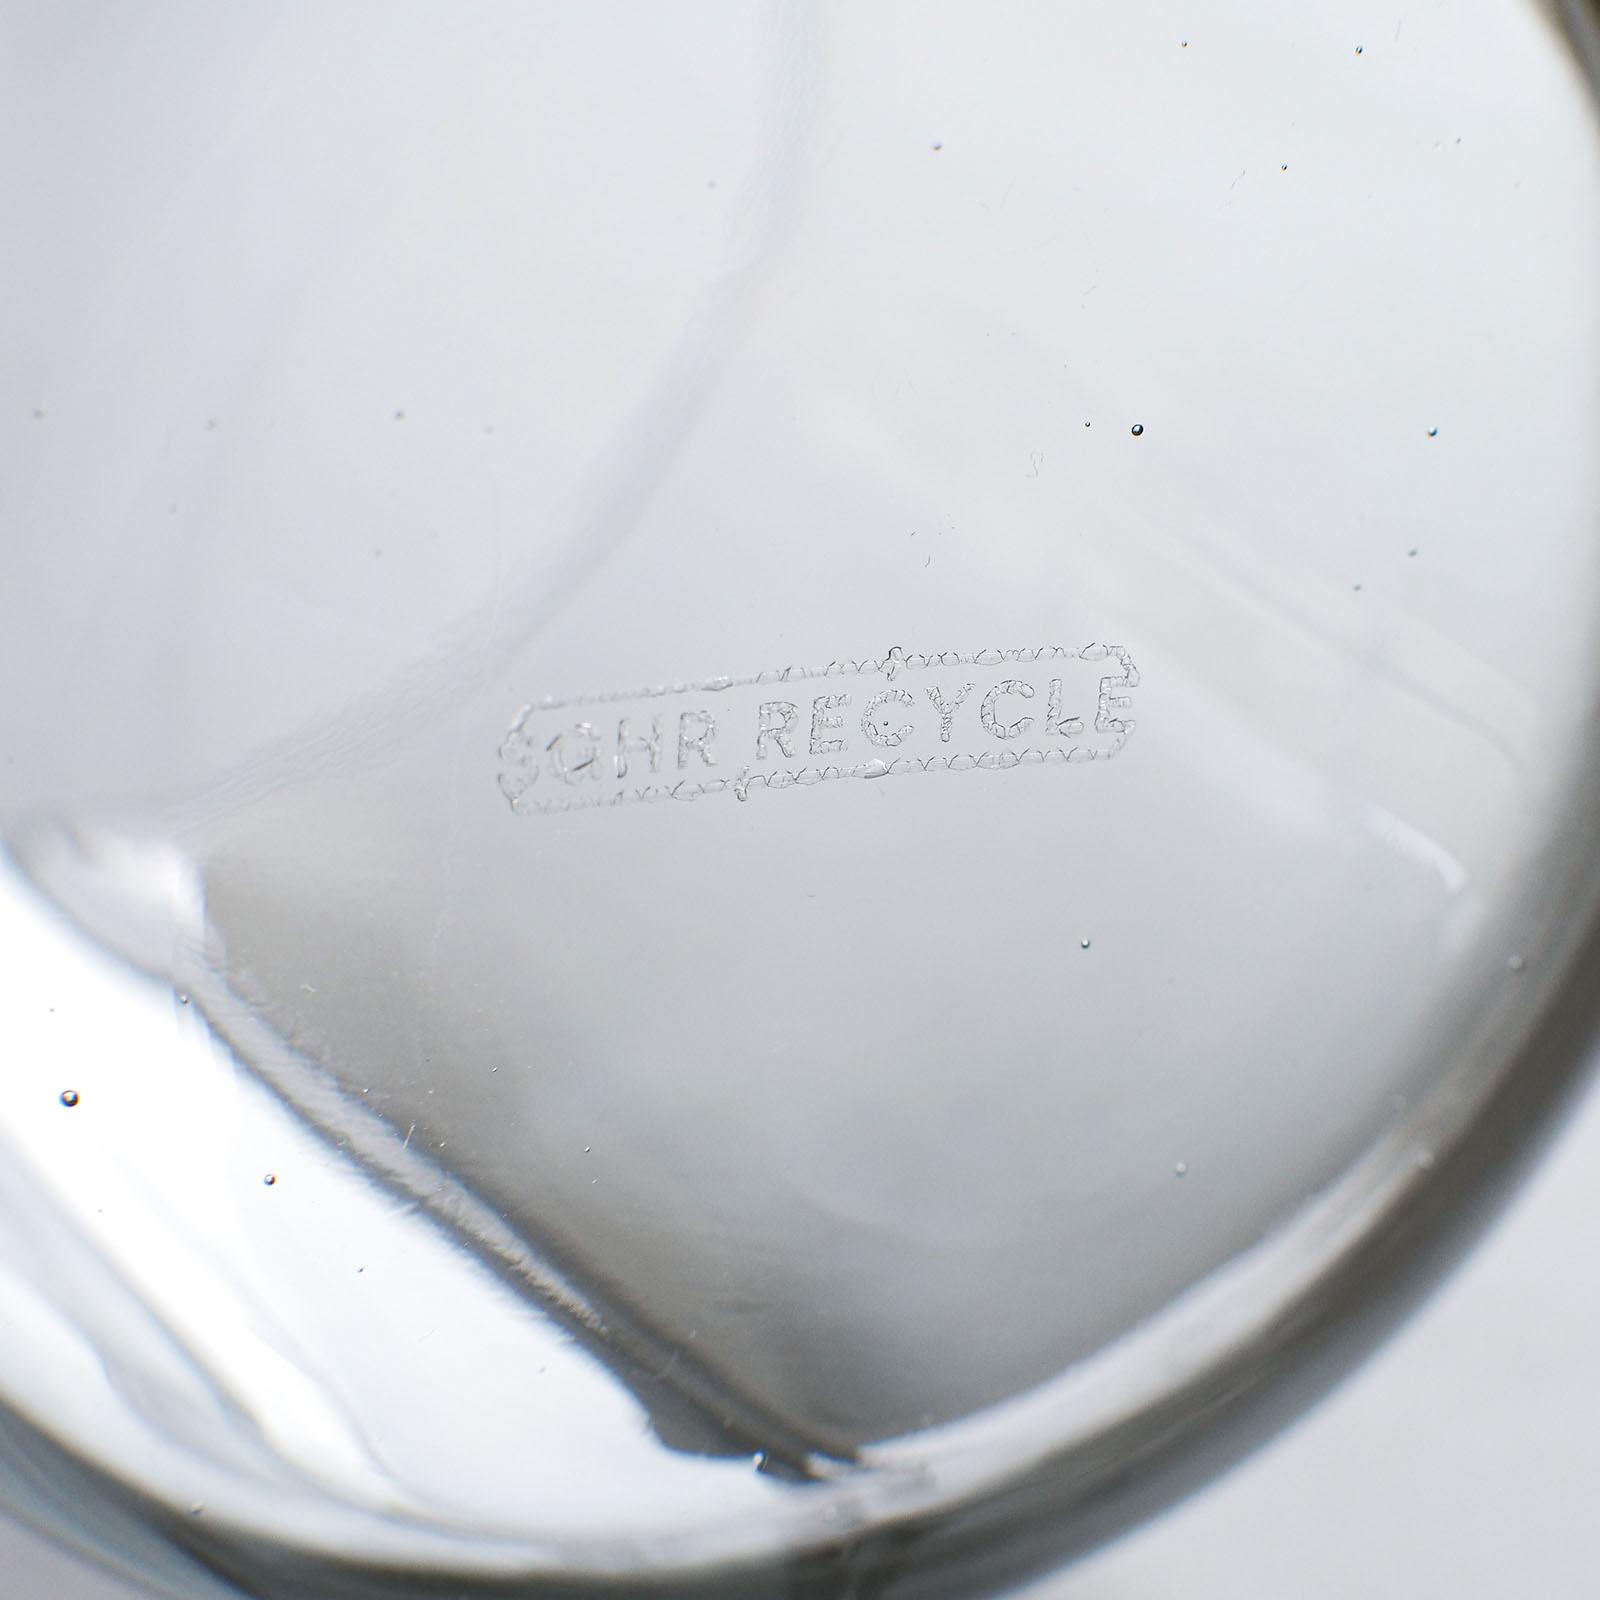 Sghr Recycle:8オンス タンブラー